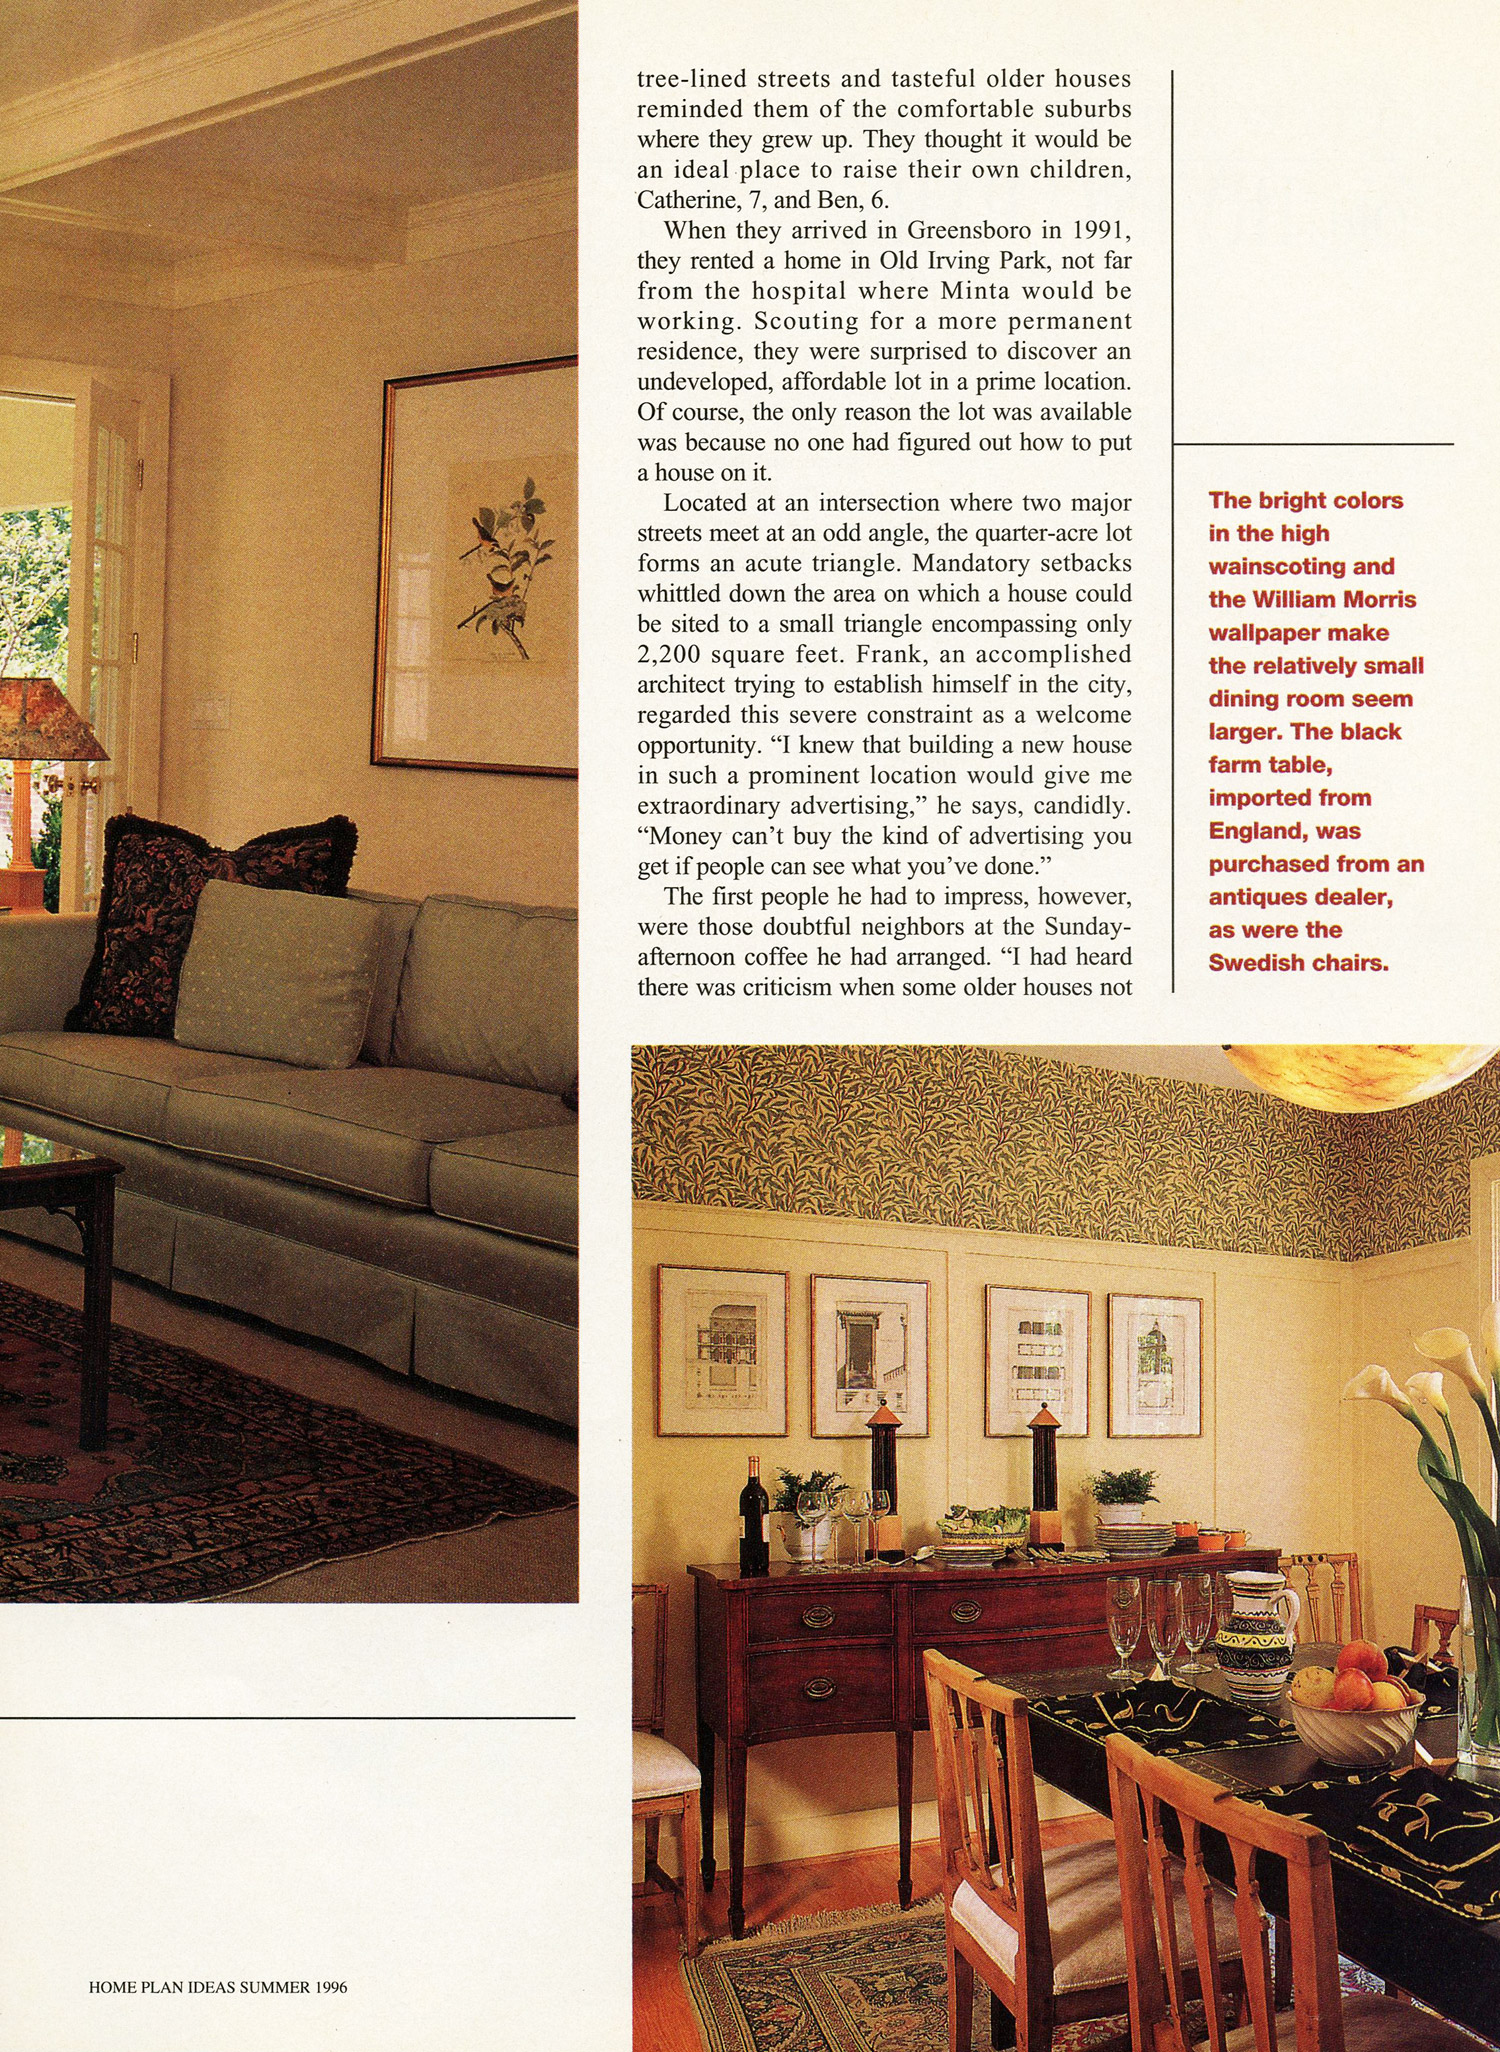 home-plan-ideas-summer-1996-frank-cheney-architect-4.jpg